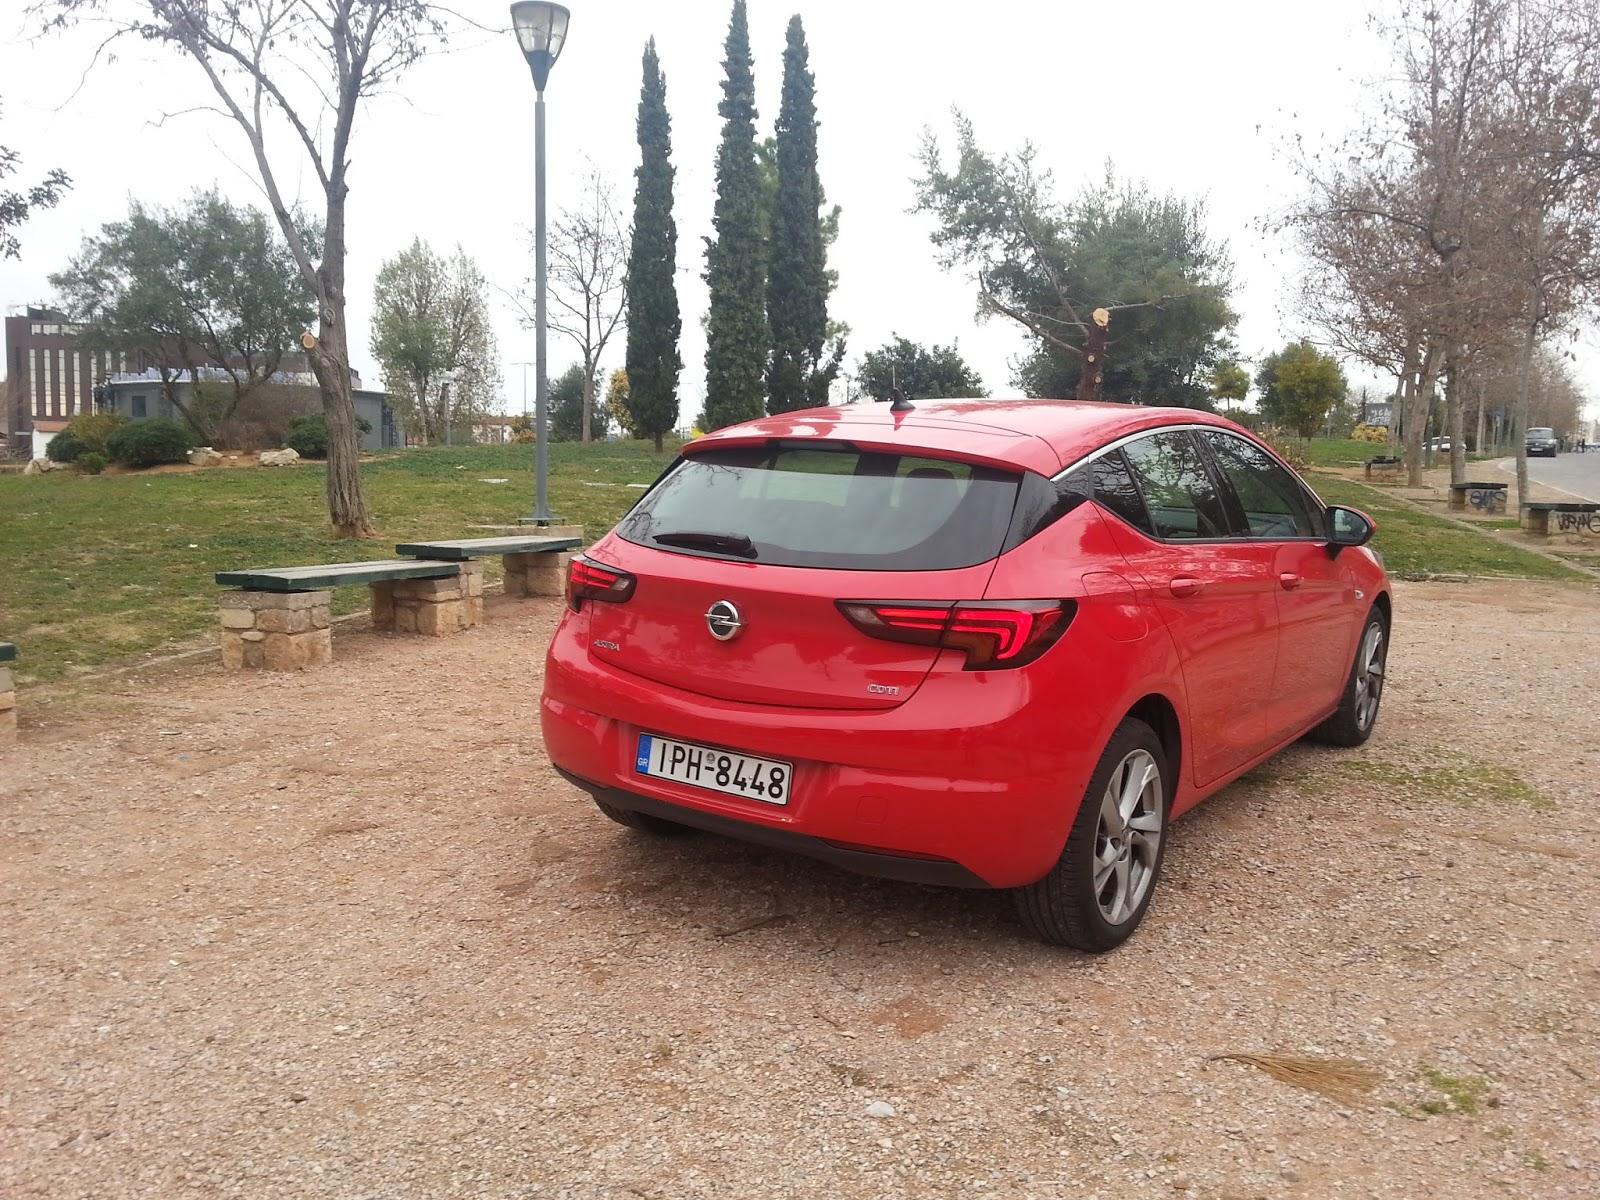 astratspiso Πόσο αστέρι είναι, τελικά, το νέο Astra; Diesel, Opel, Opel Astra, TEST, zblog, ΔΟΚΙΜΕΣ, οδηγούμε